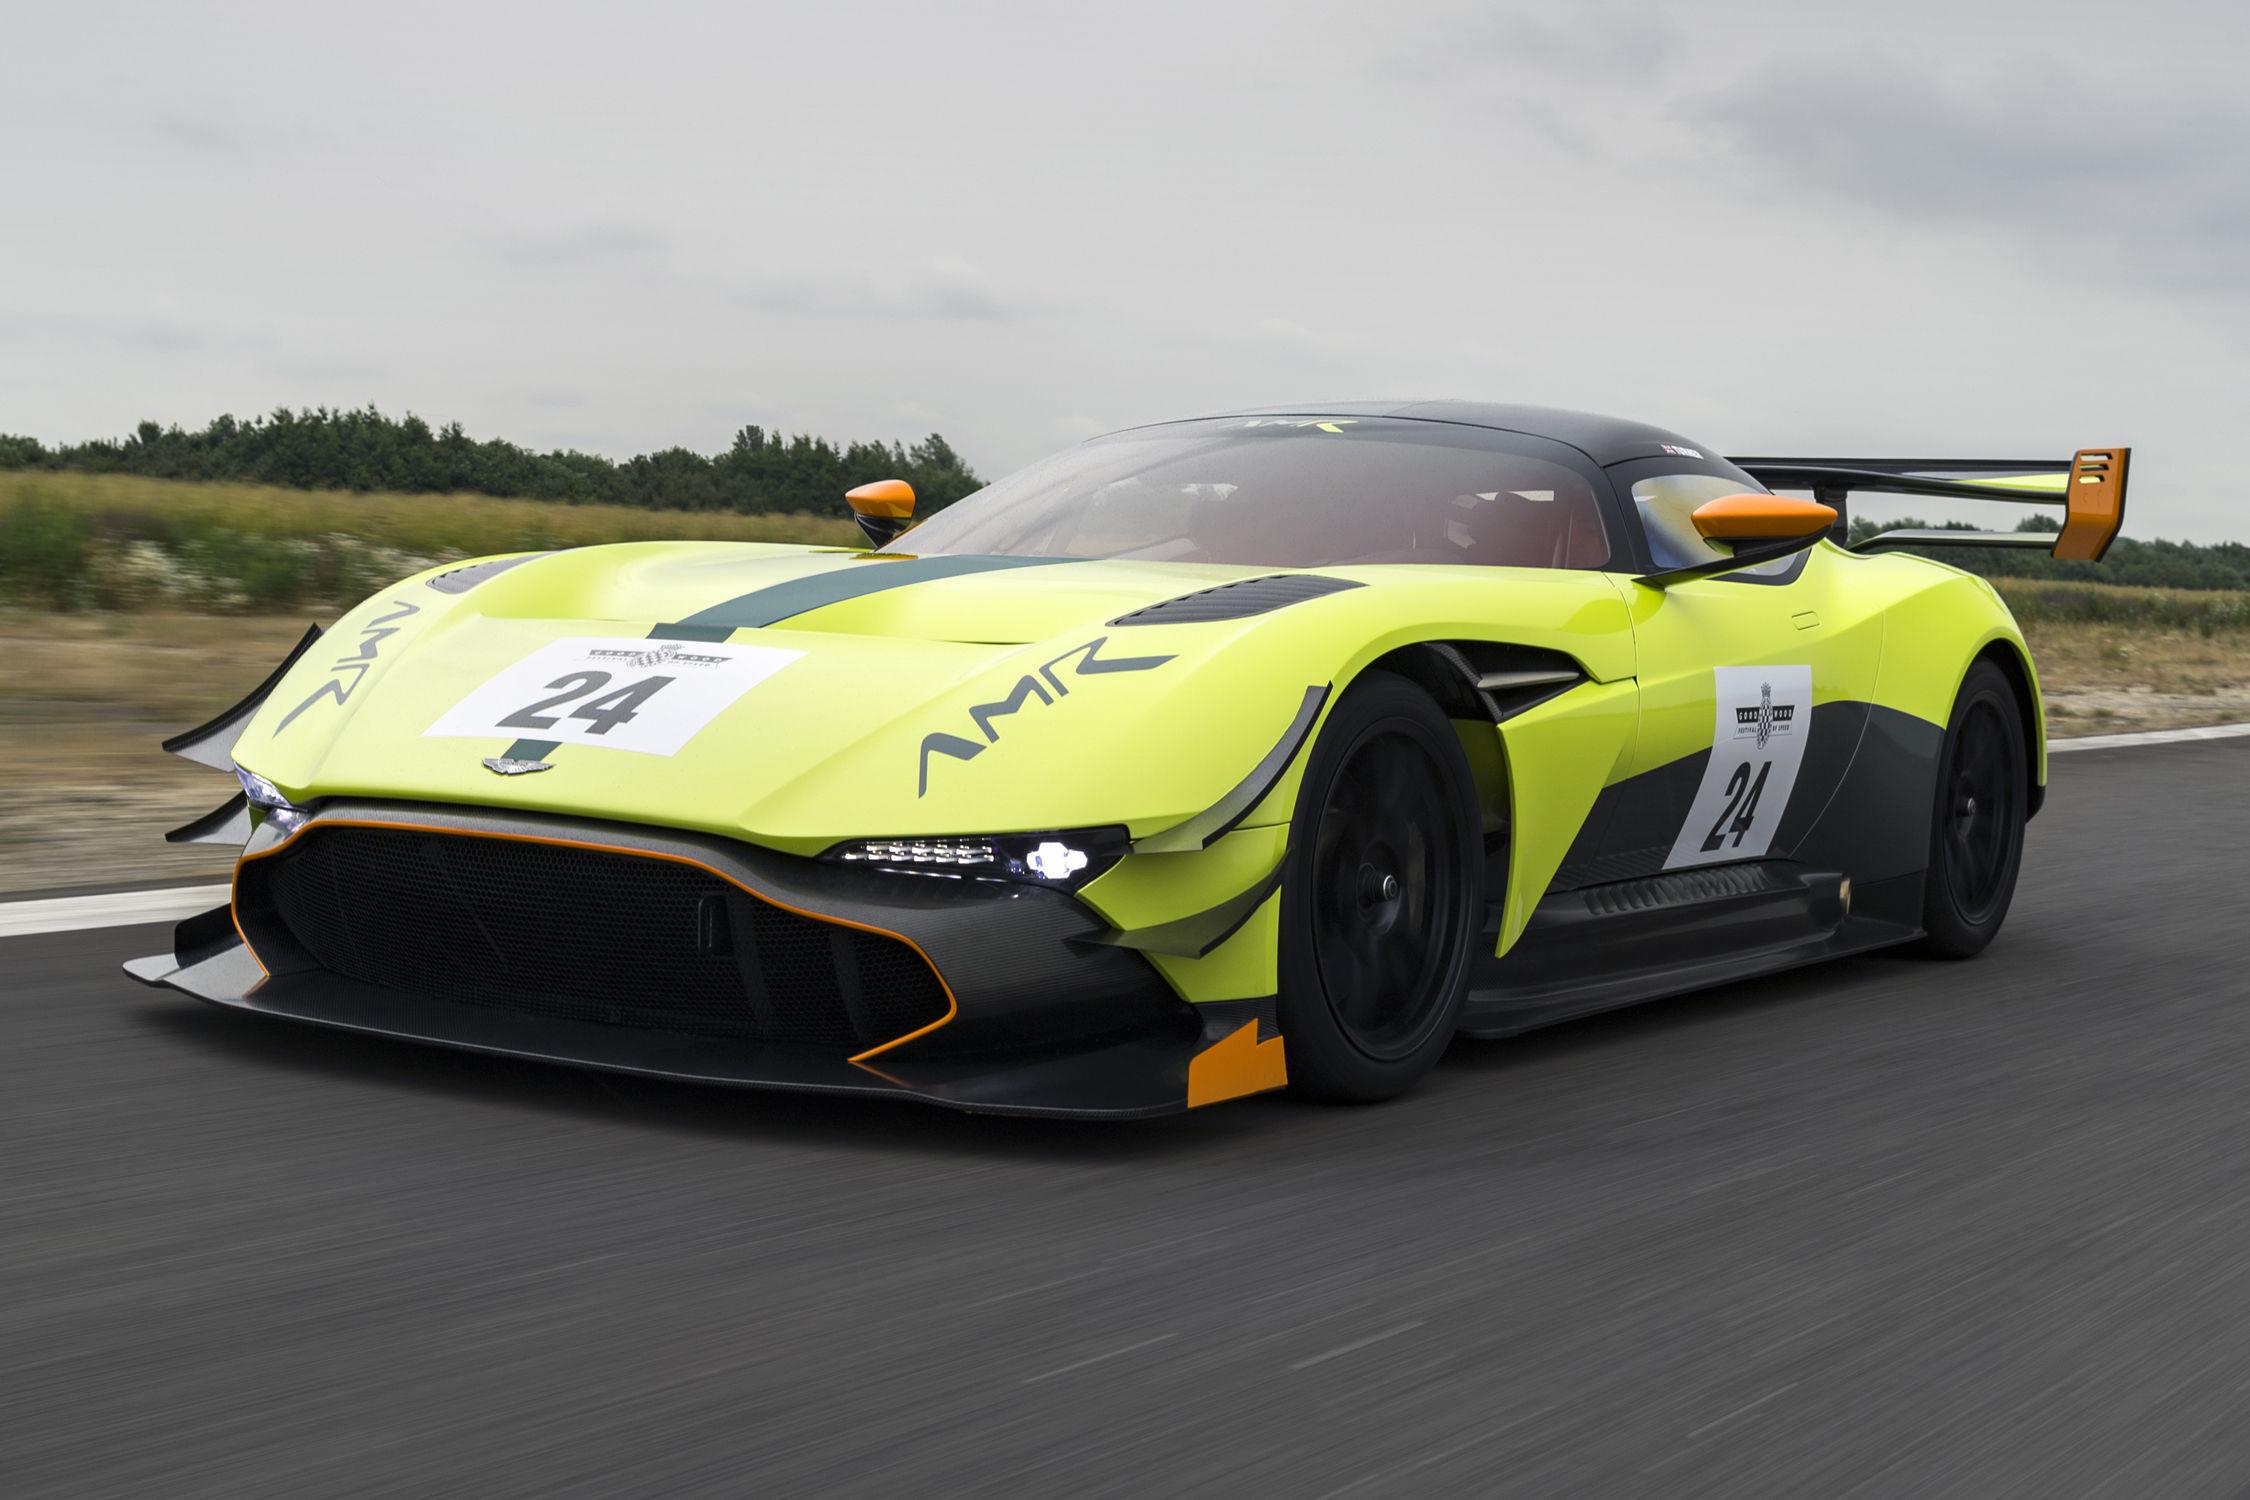 2017 - [Aston Martin] Vantage - Page 2 Aston-martin-vulcan-16131-1-P